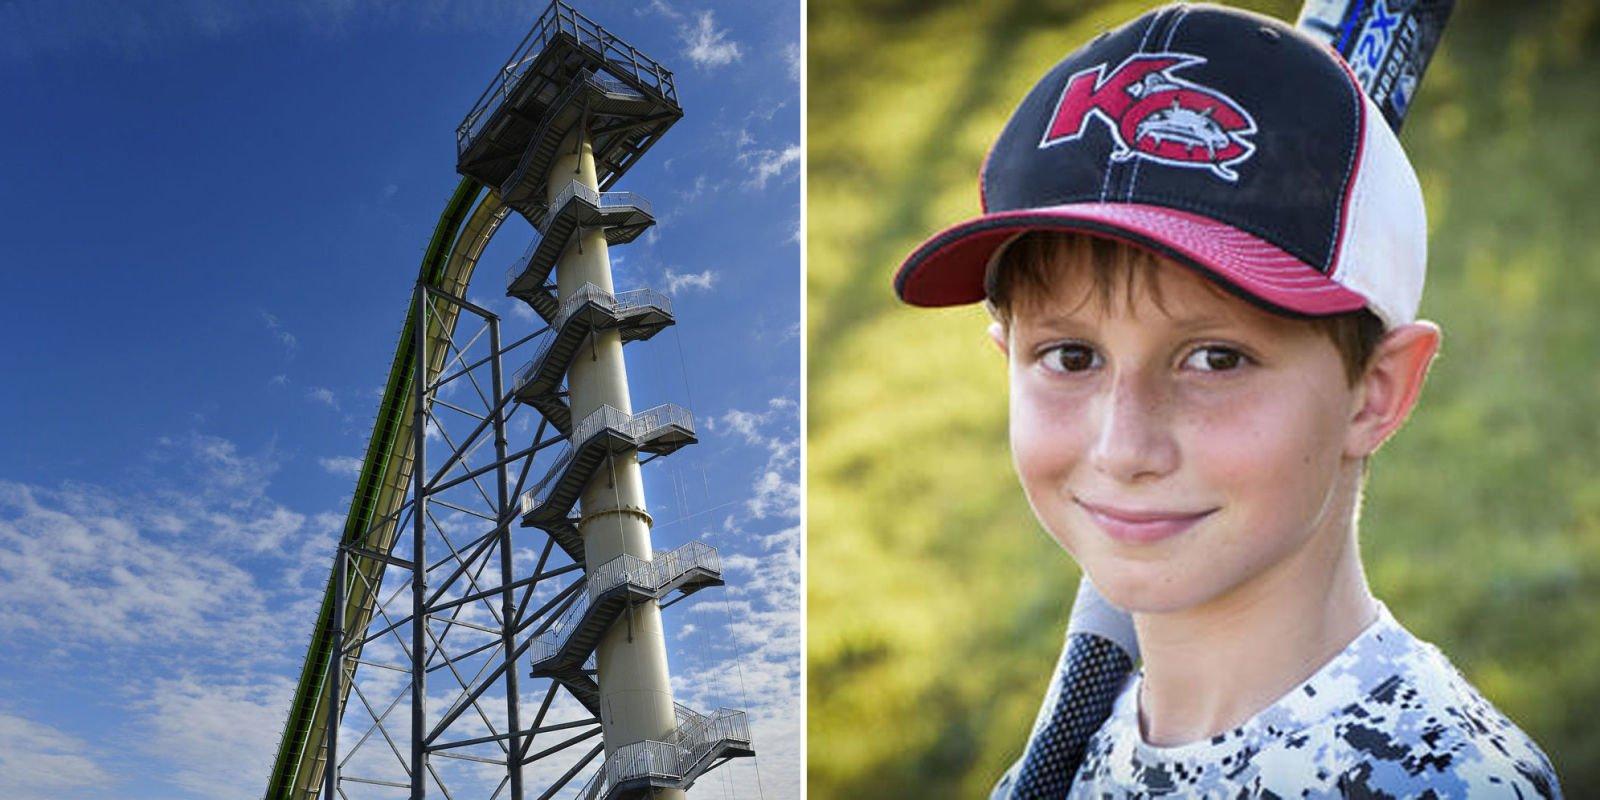 The water slide that killed 10-year-old Caleb Schwab hadn't been inspected since 2014 https://t.co/SGNPKCCNuj https://t.co/Iku5ktVPxt